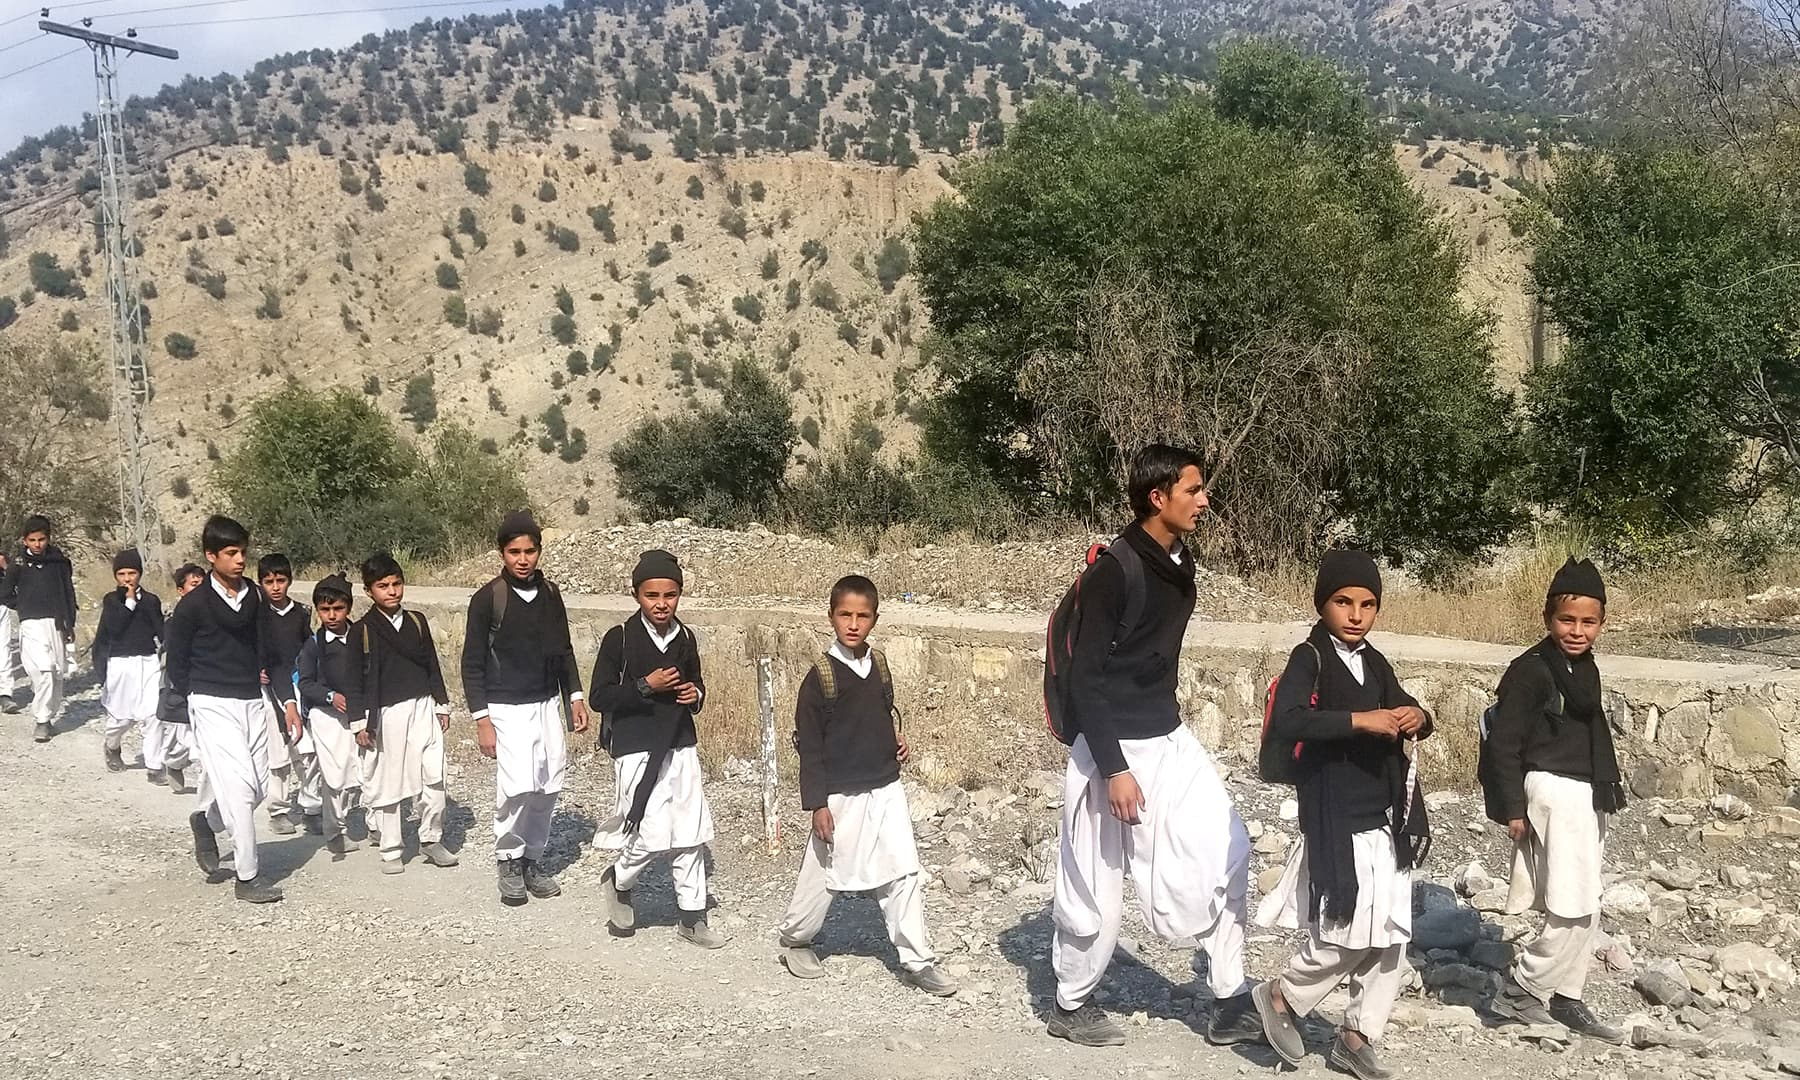 Children on their way to school in South Waziristan.